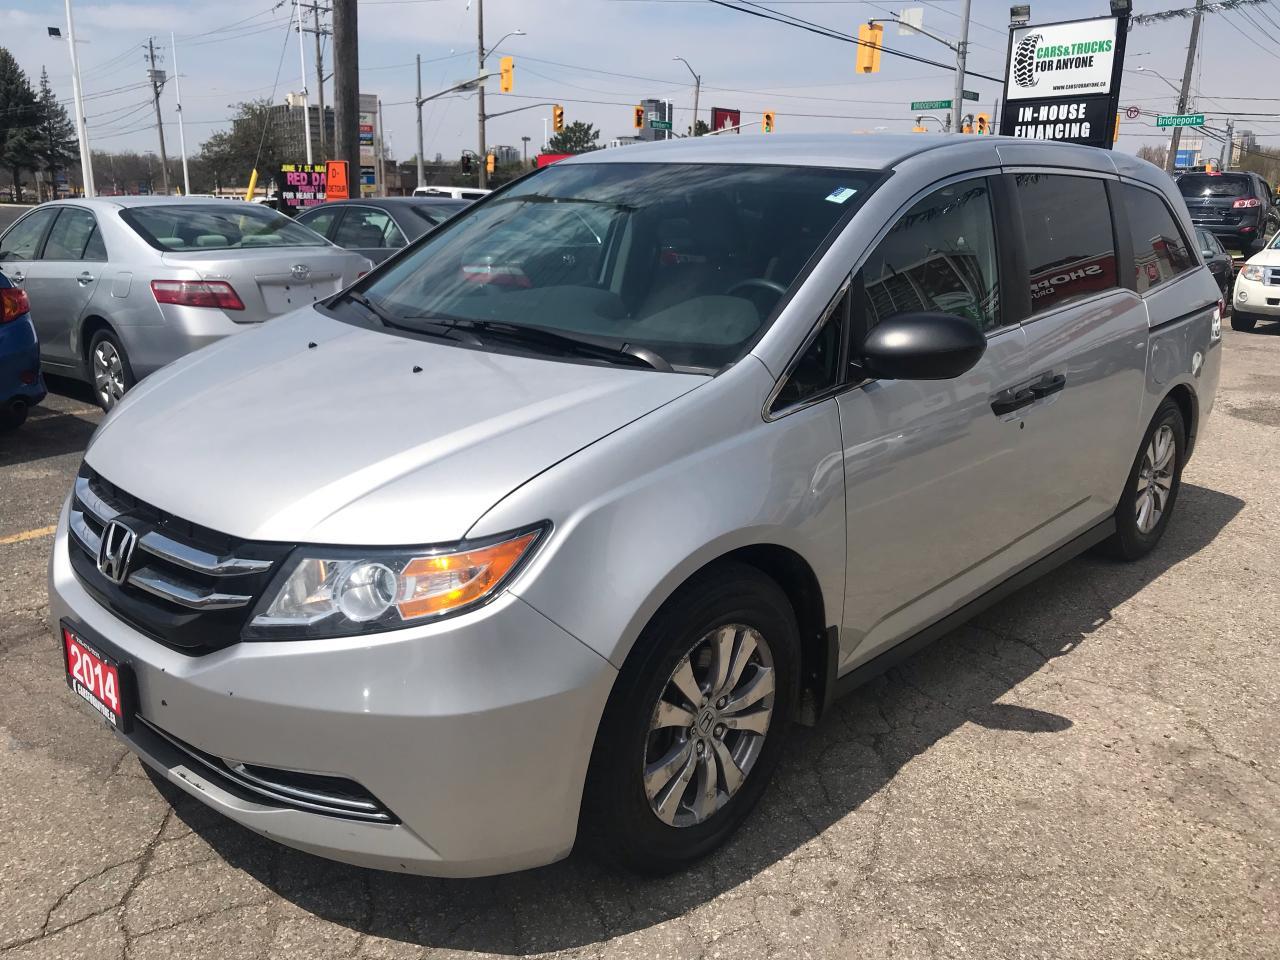 2014 Honda Odyssey SE l 8 Passenger l No Accidents l Low Km